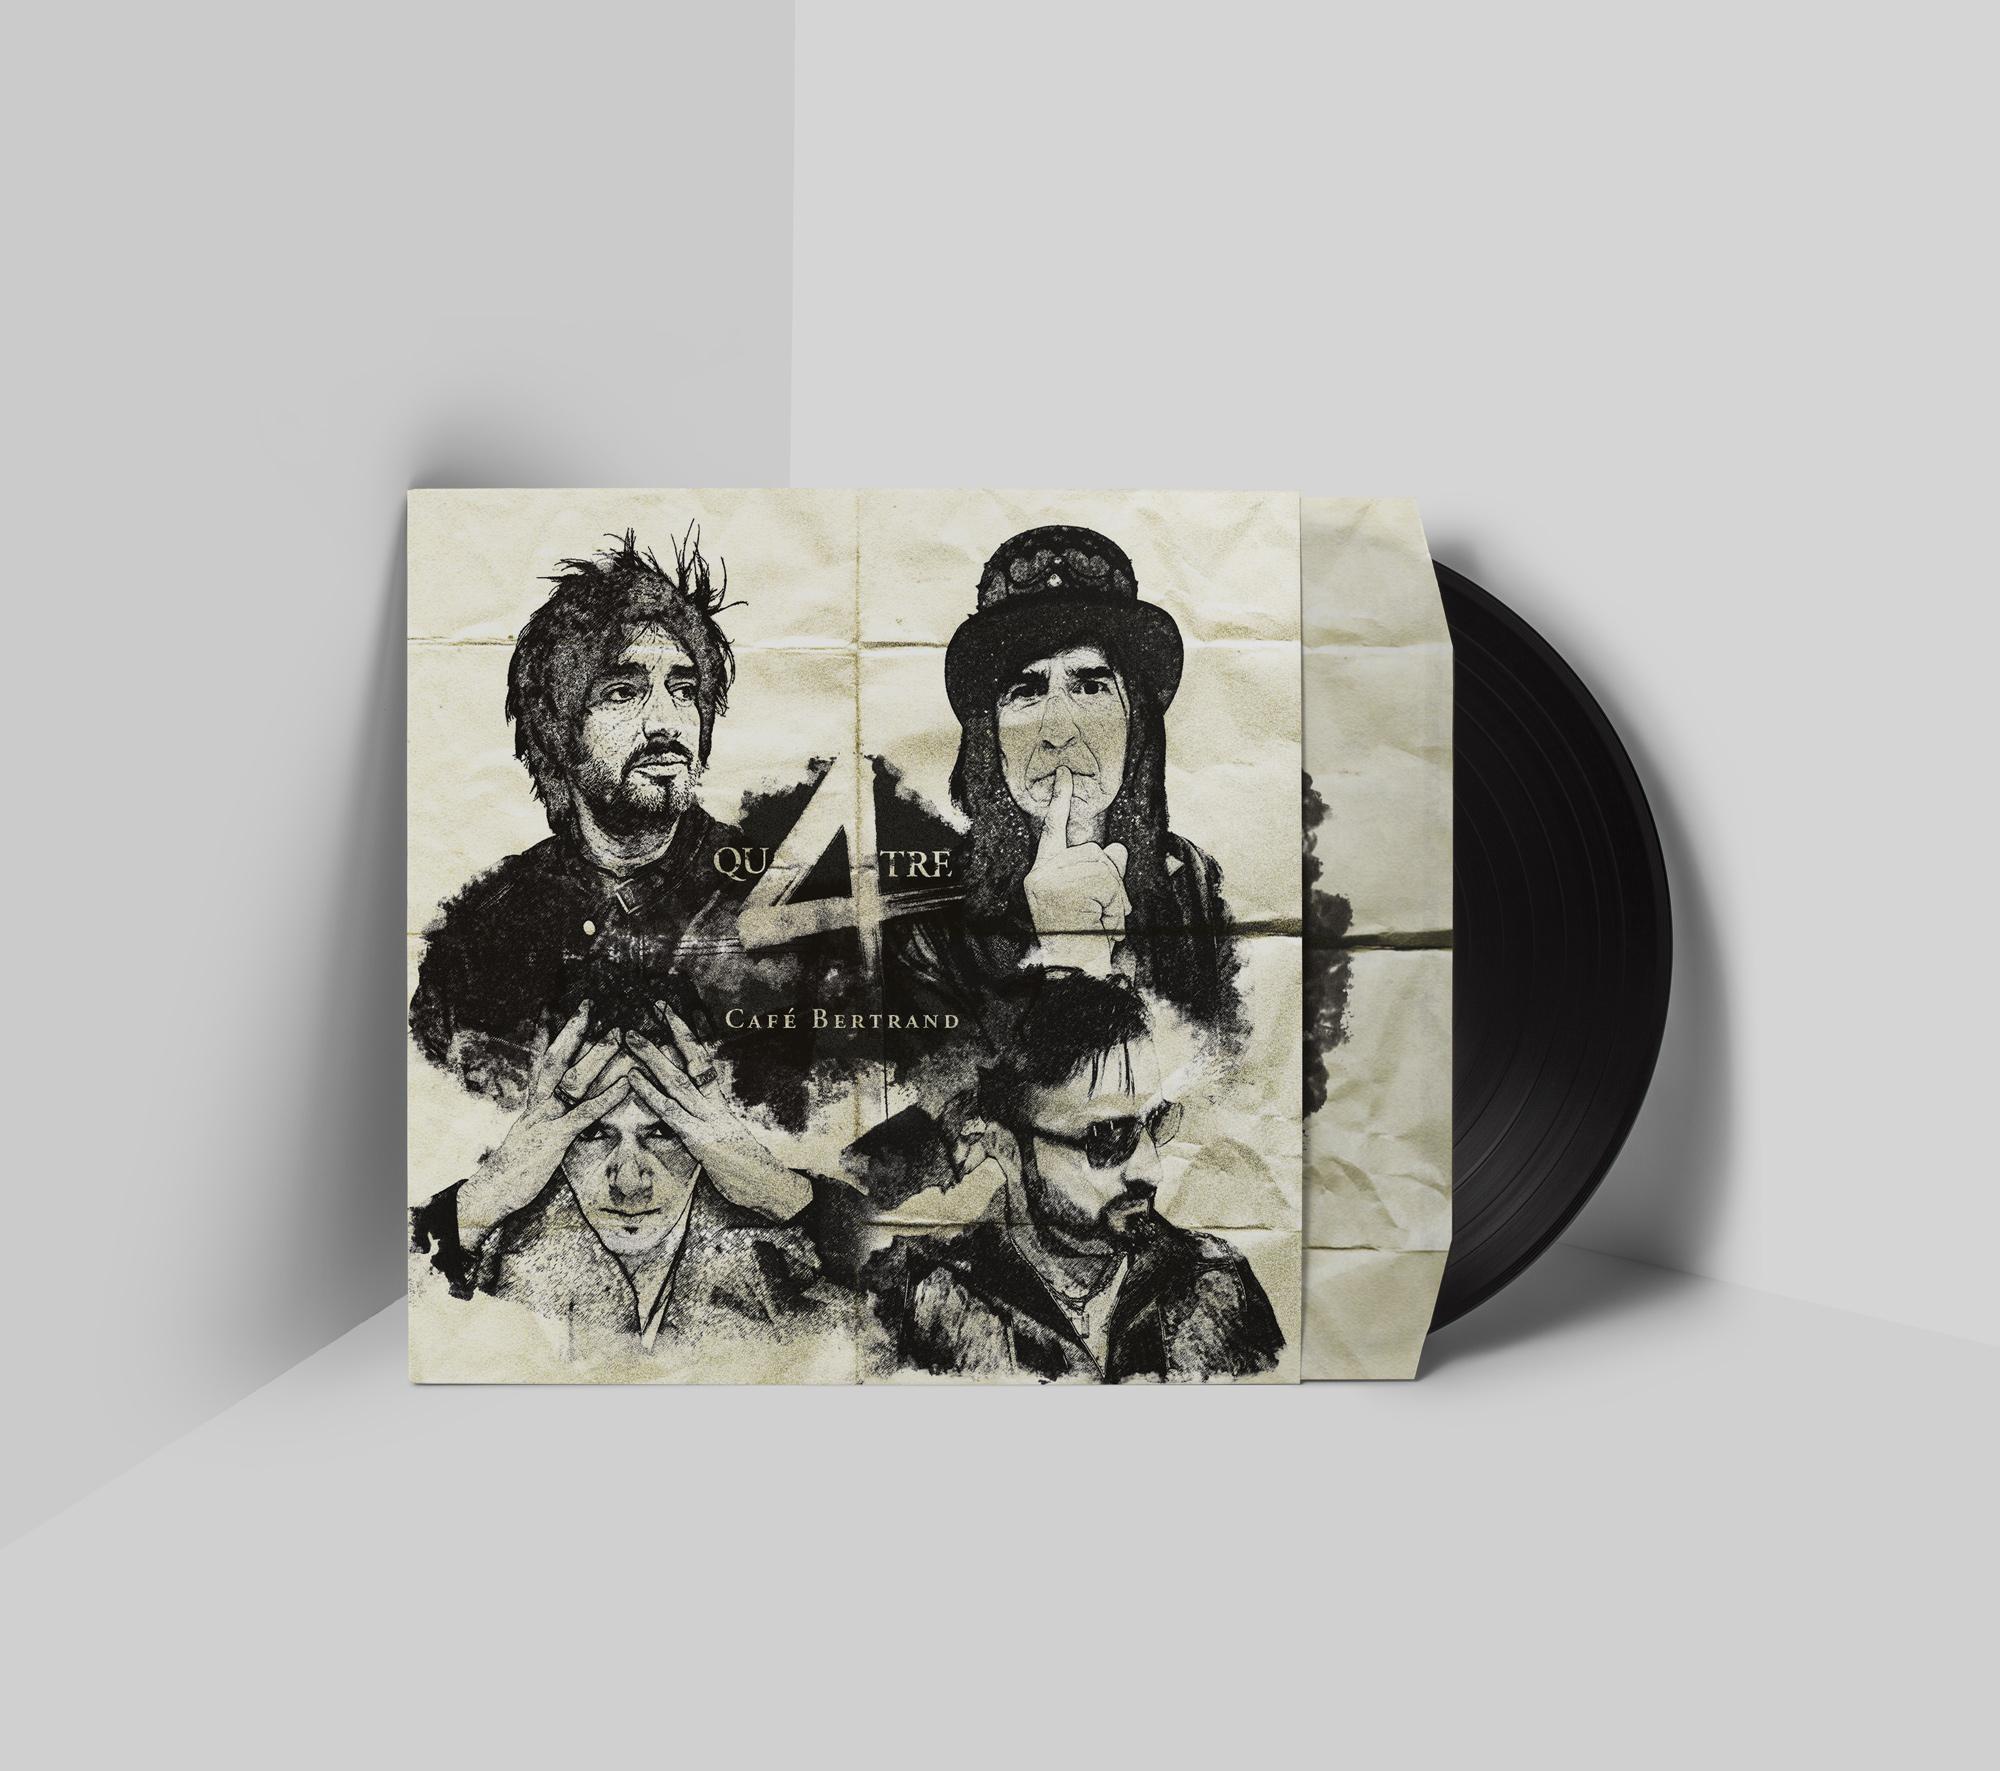 Café Bertrand - Qu4TRE vinyle